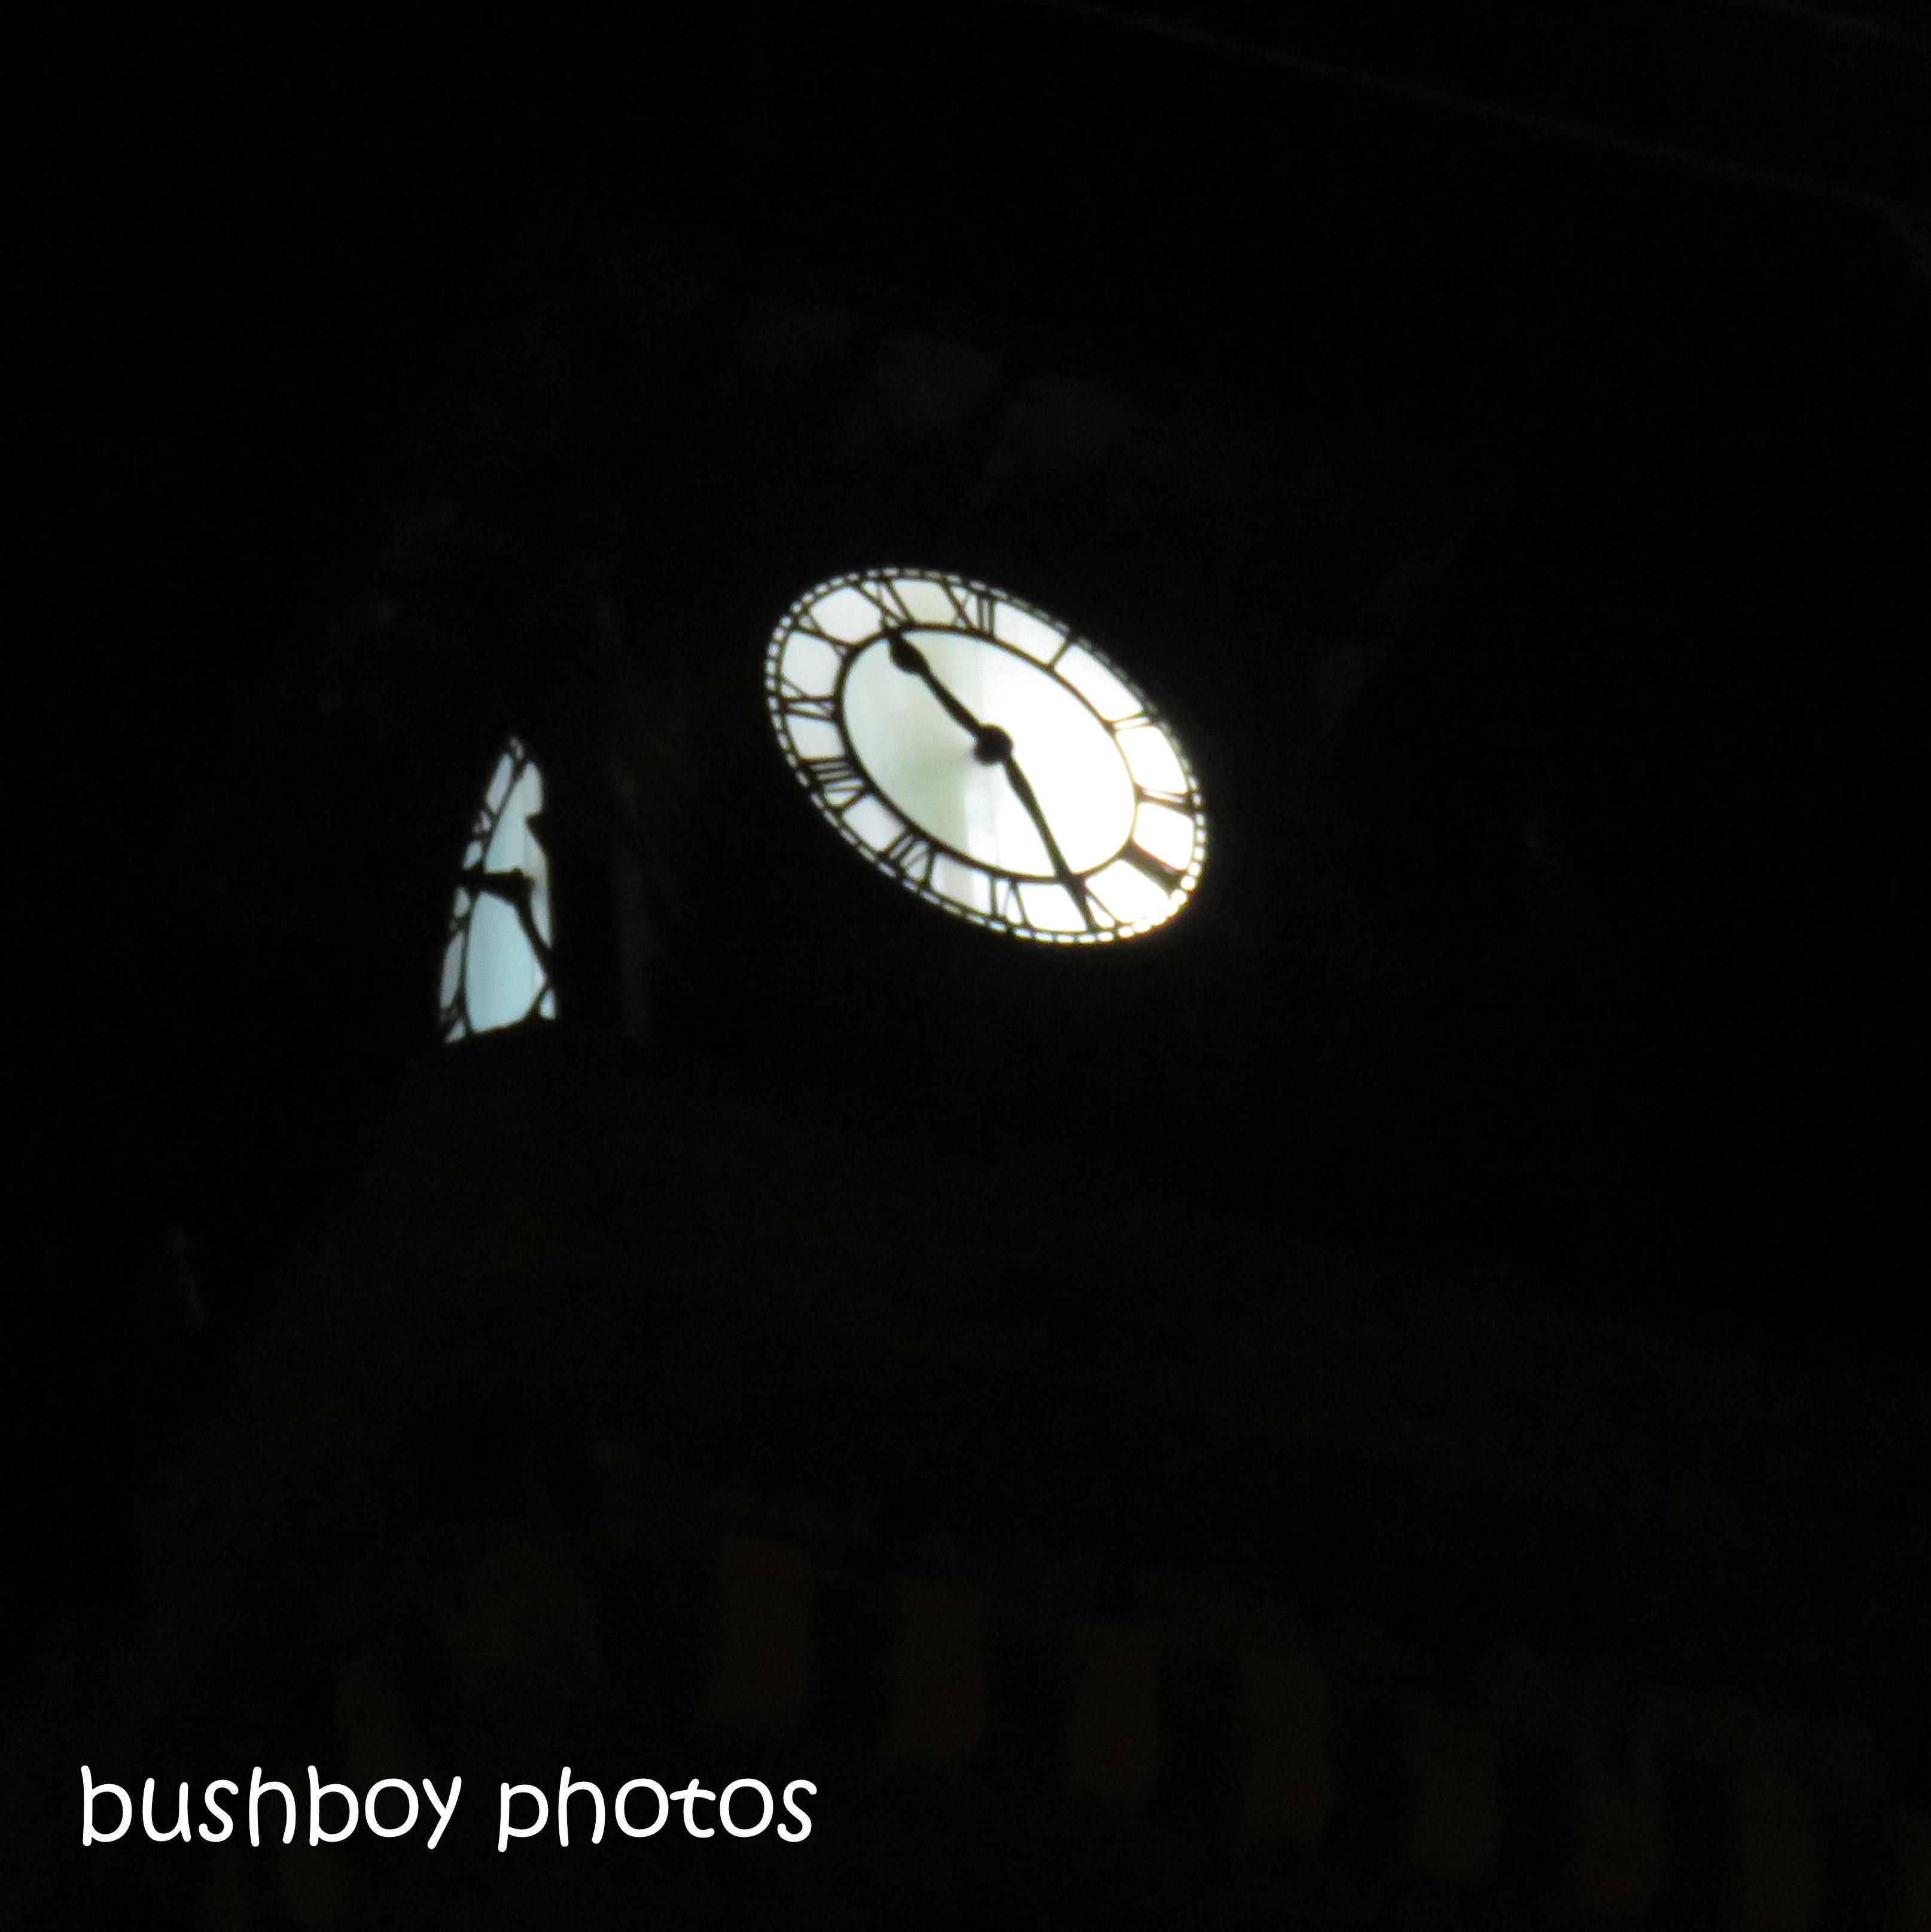 181218__time_square_longest_time_clock_night